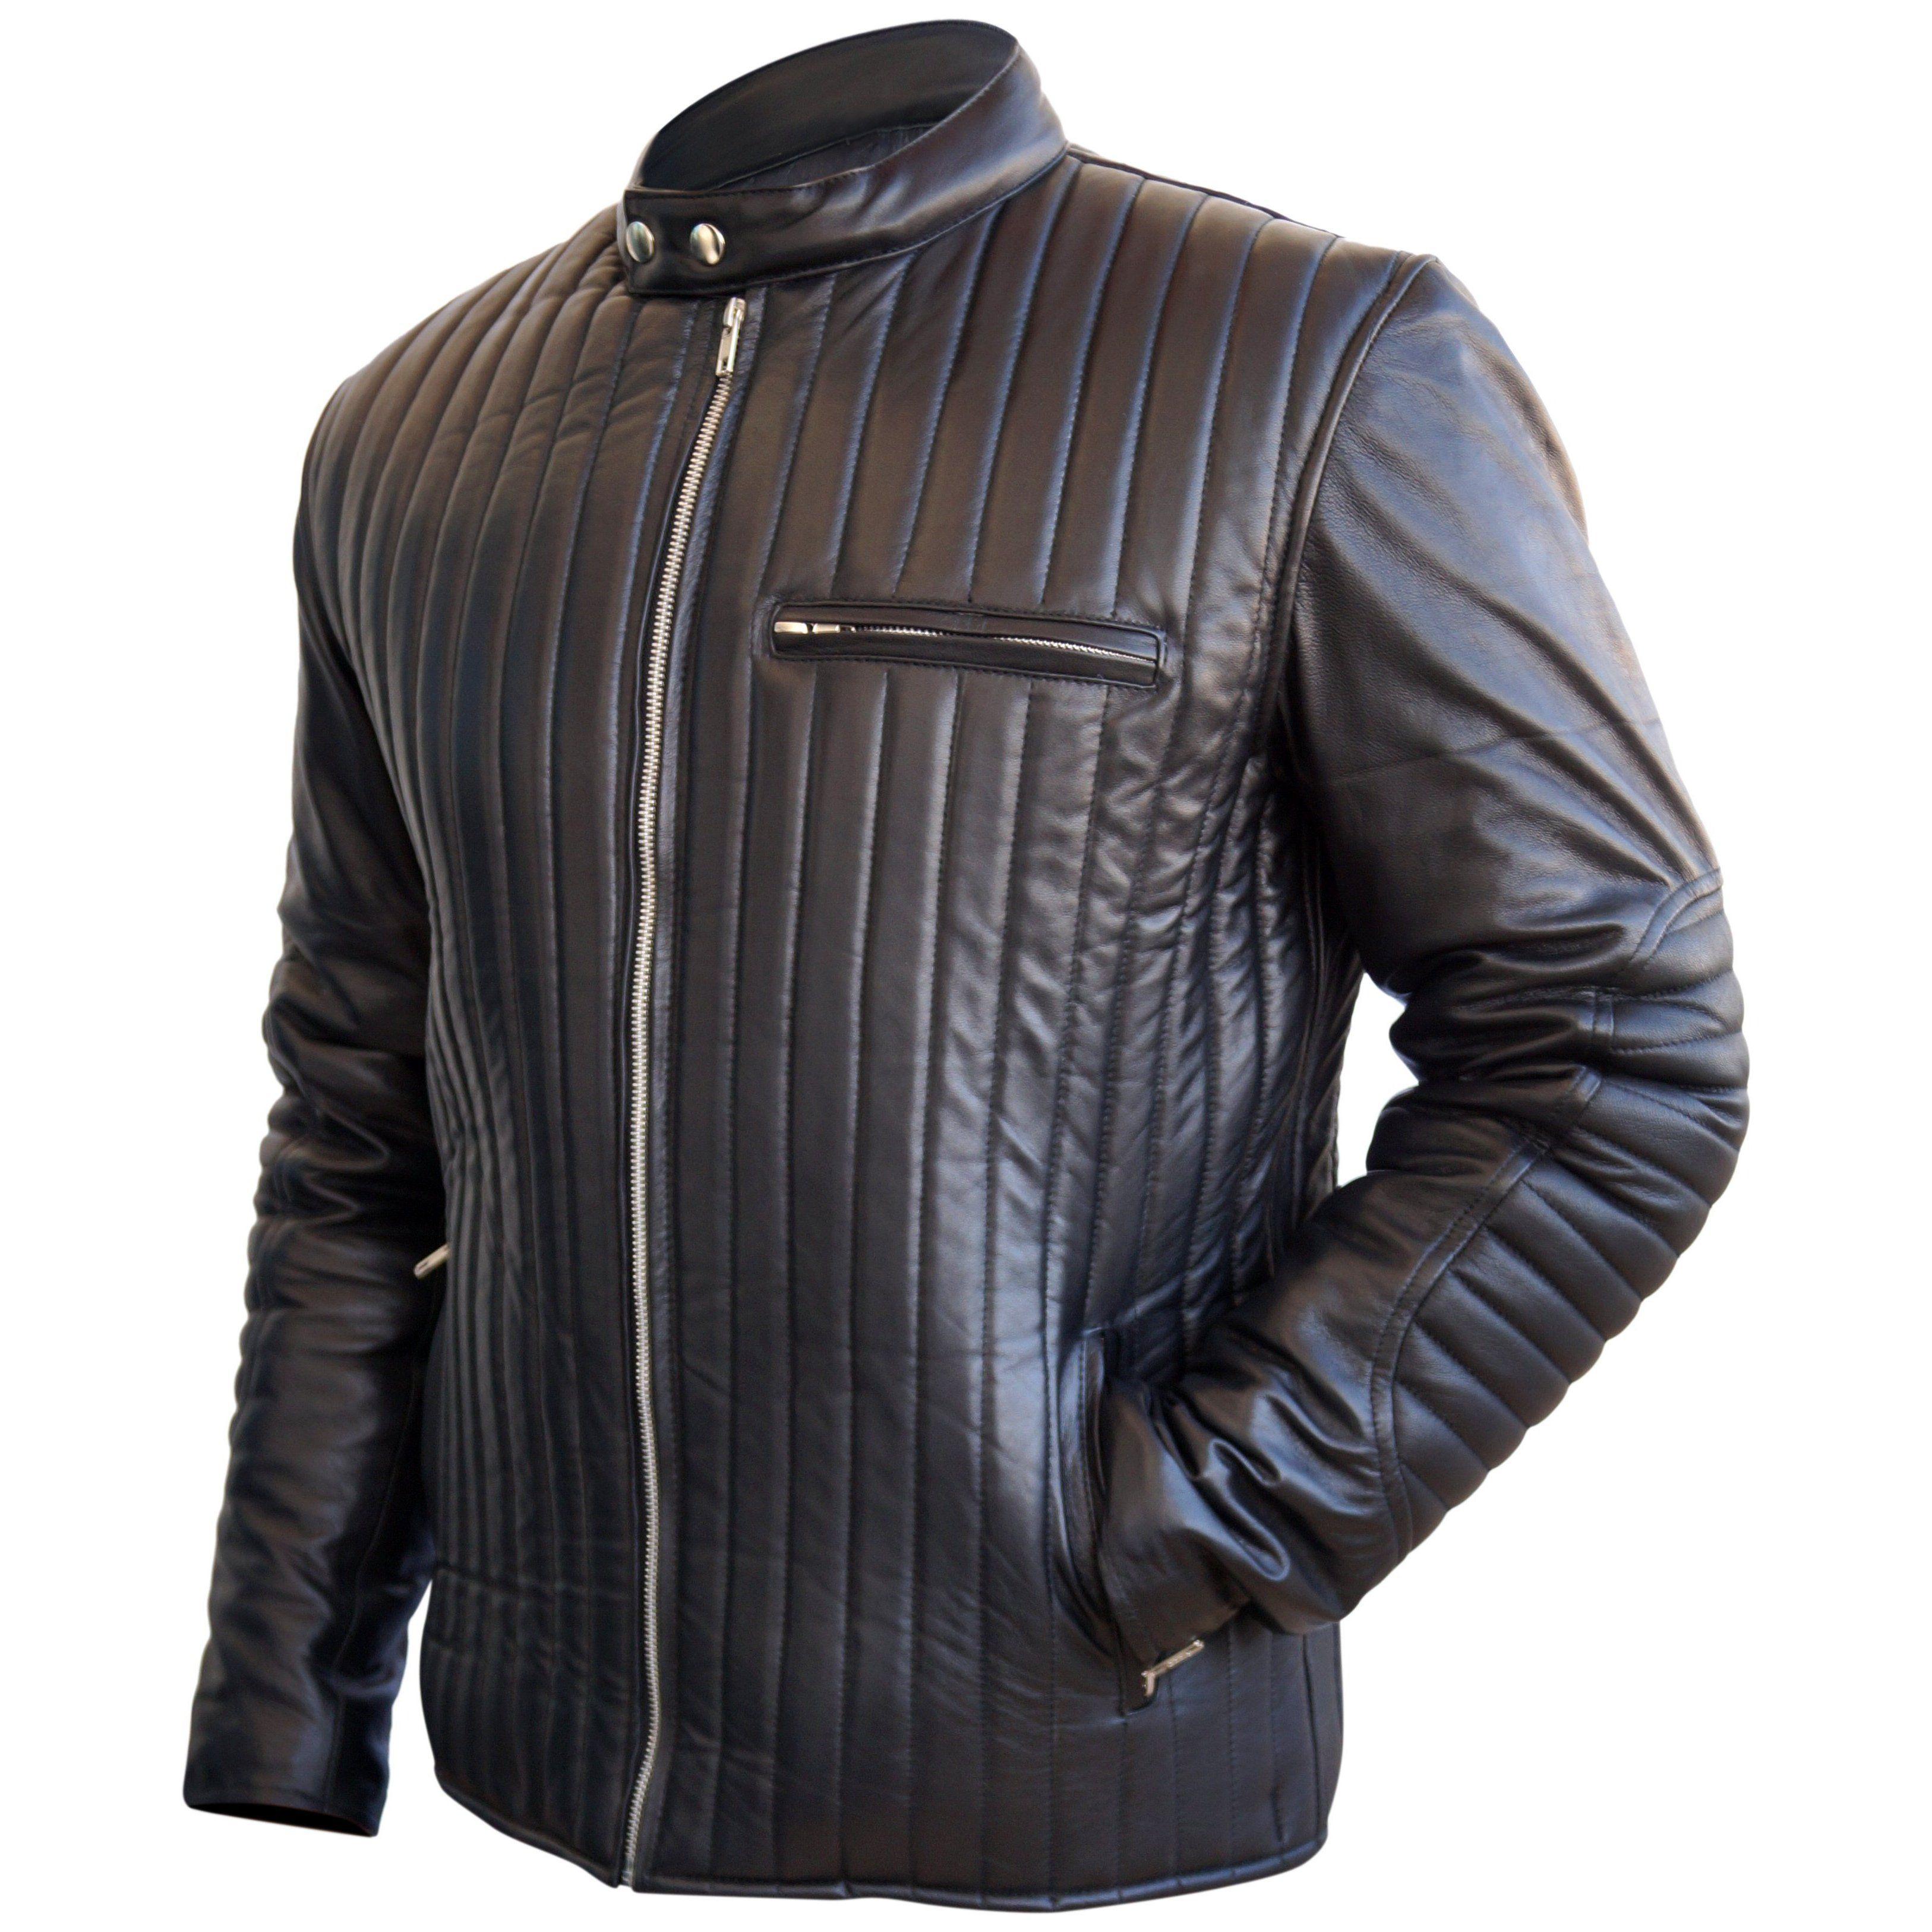 Leather Skin Men Black Rib Quilted Genuine Leather Jacket Stylish Leather Jacket Leather Jacket Men Men S Leather Jacket [ 3252 x 3252 Pixel ]